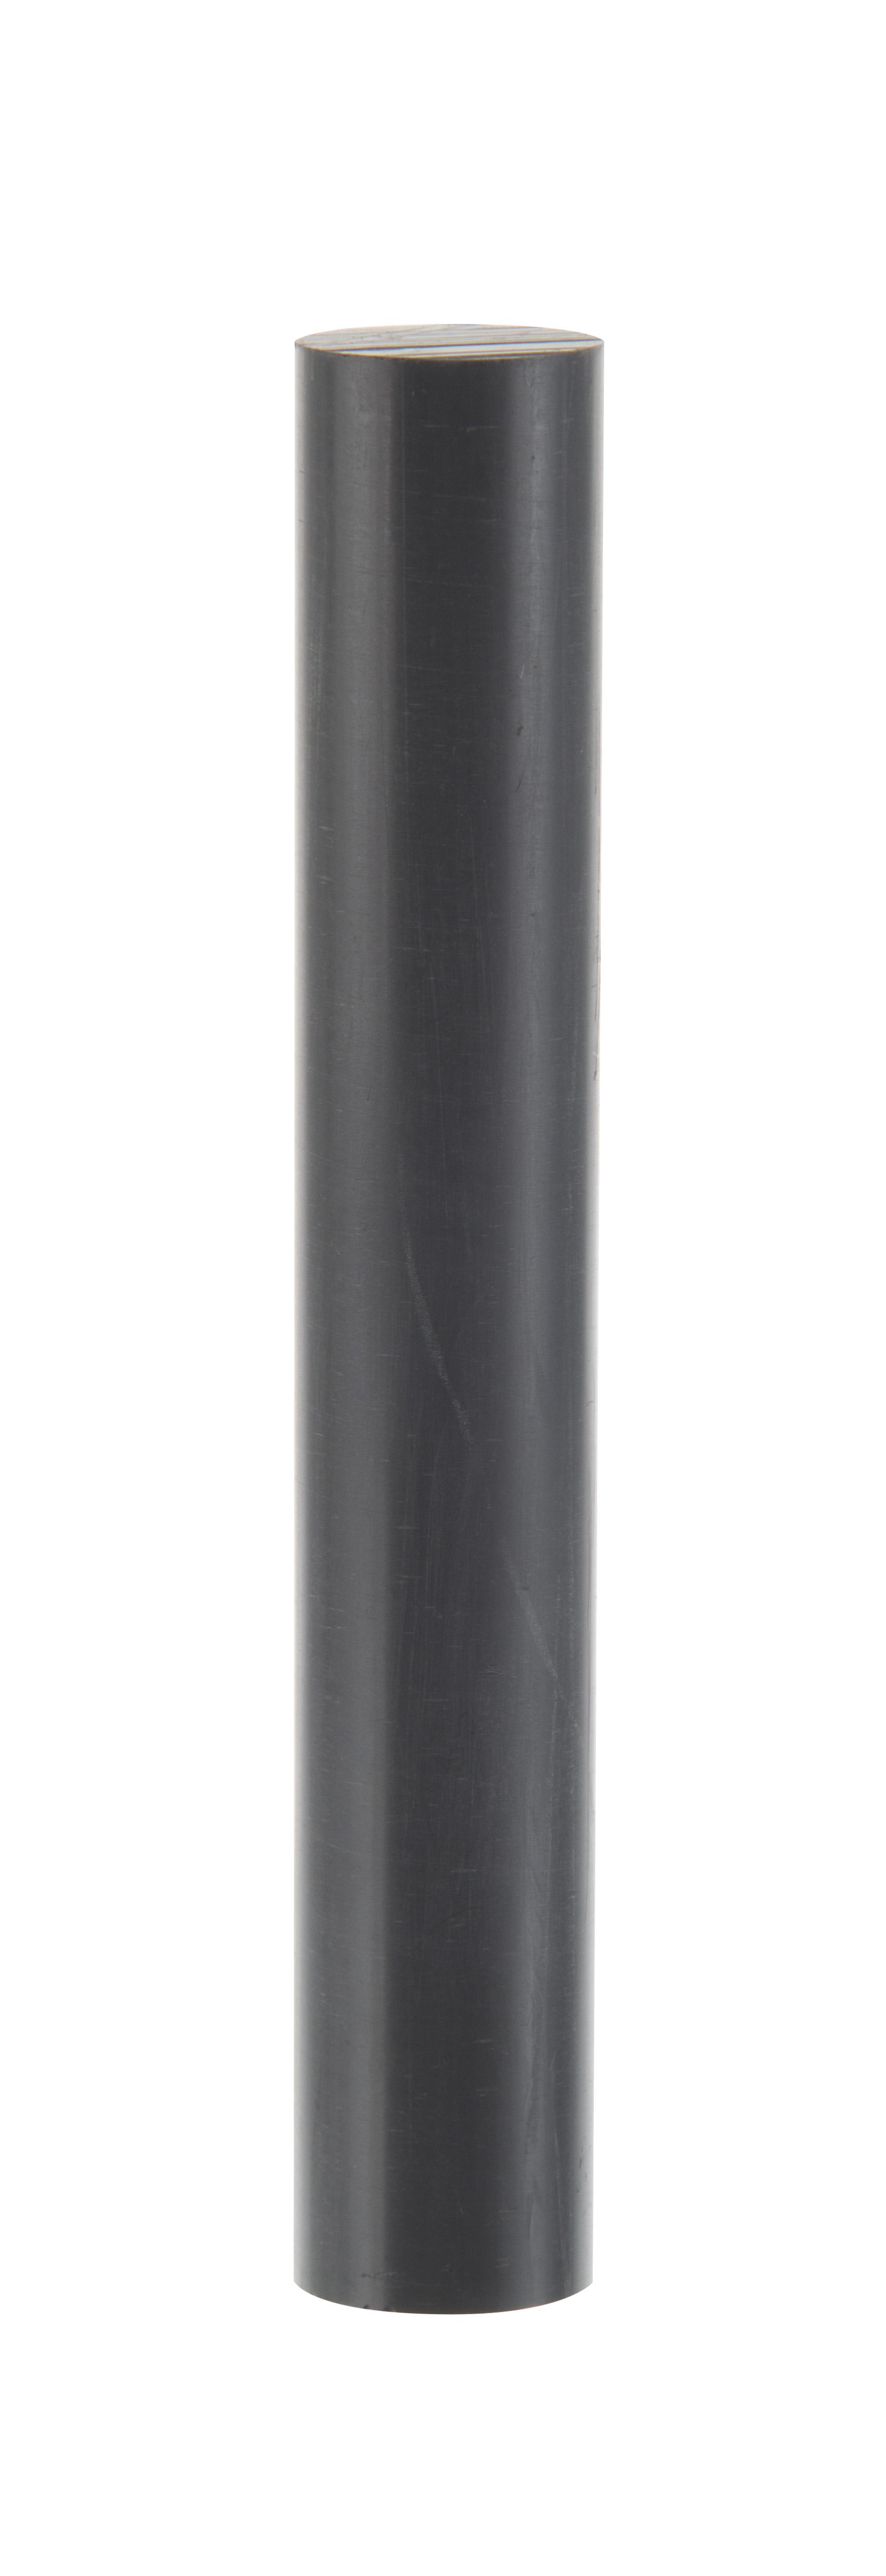 Pvc Type 1 Gray Rod Acme Plastics Inc